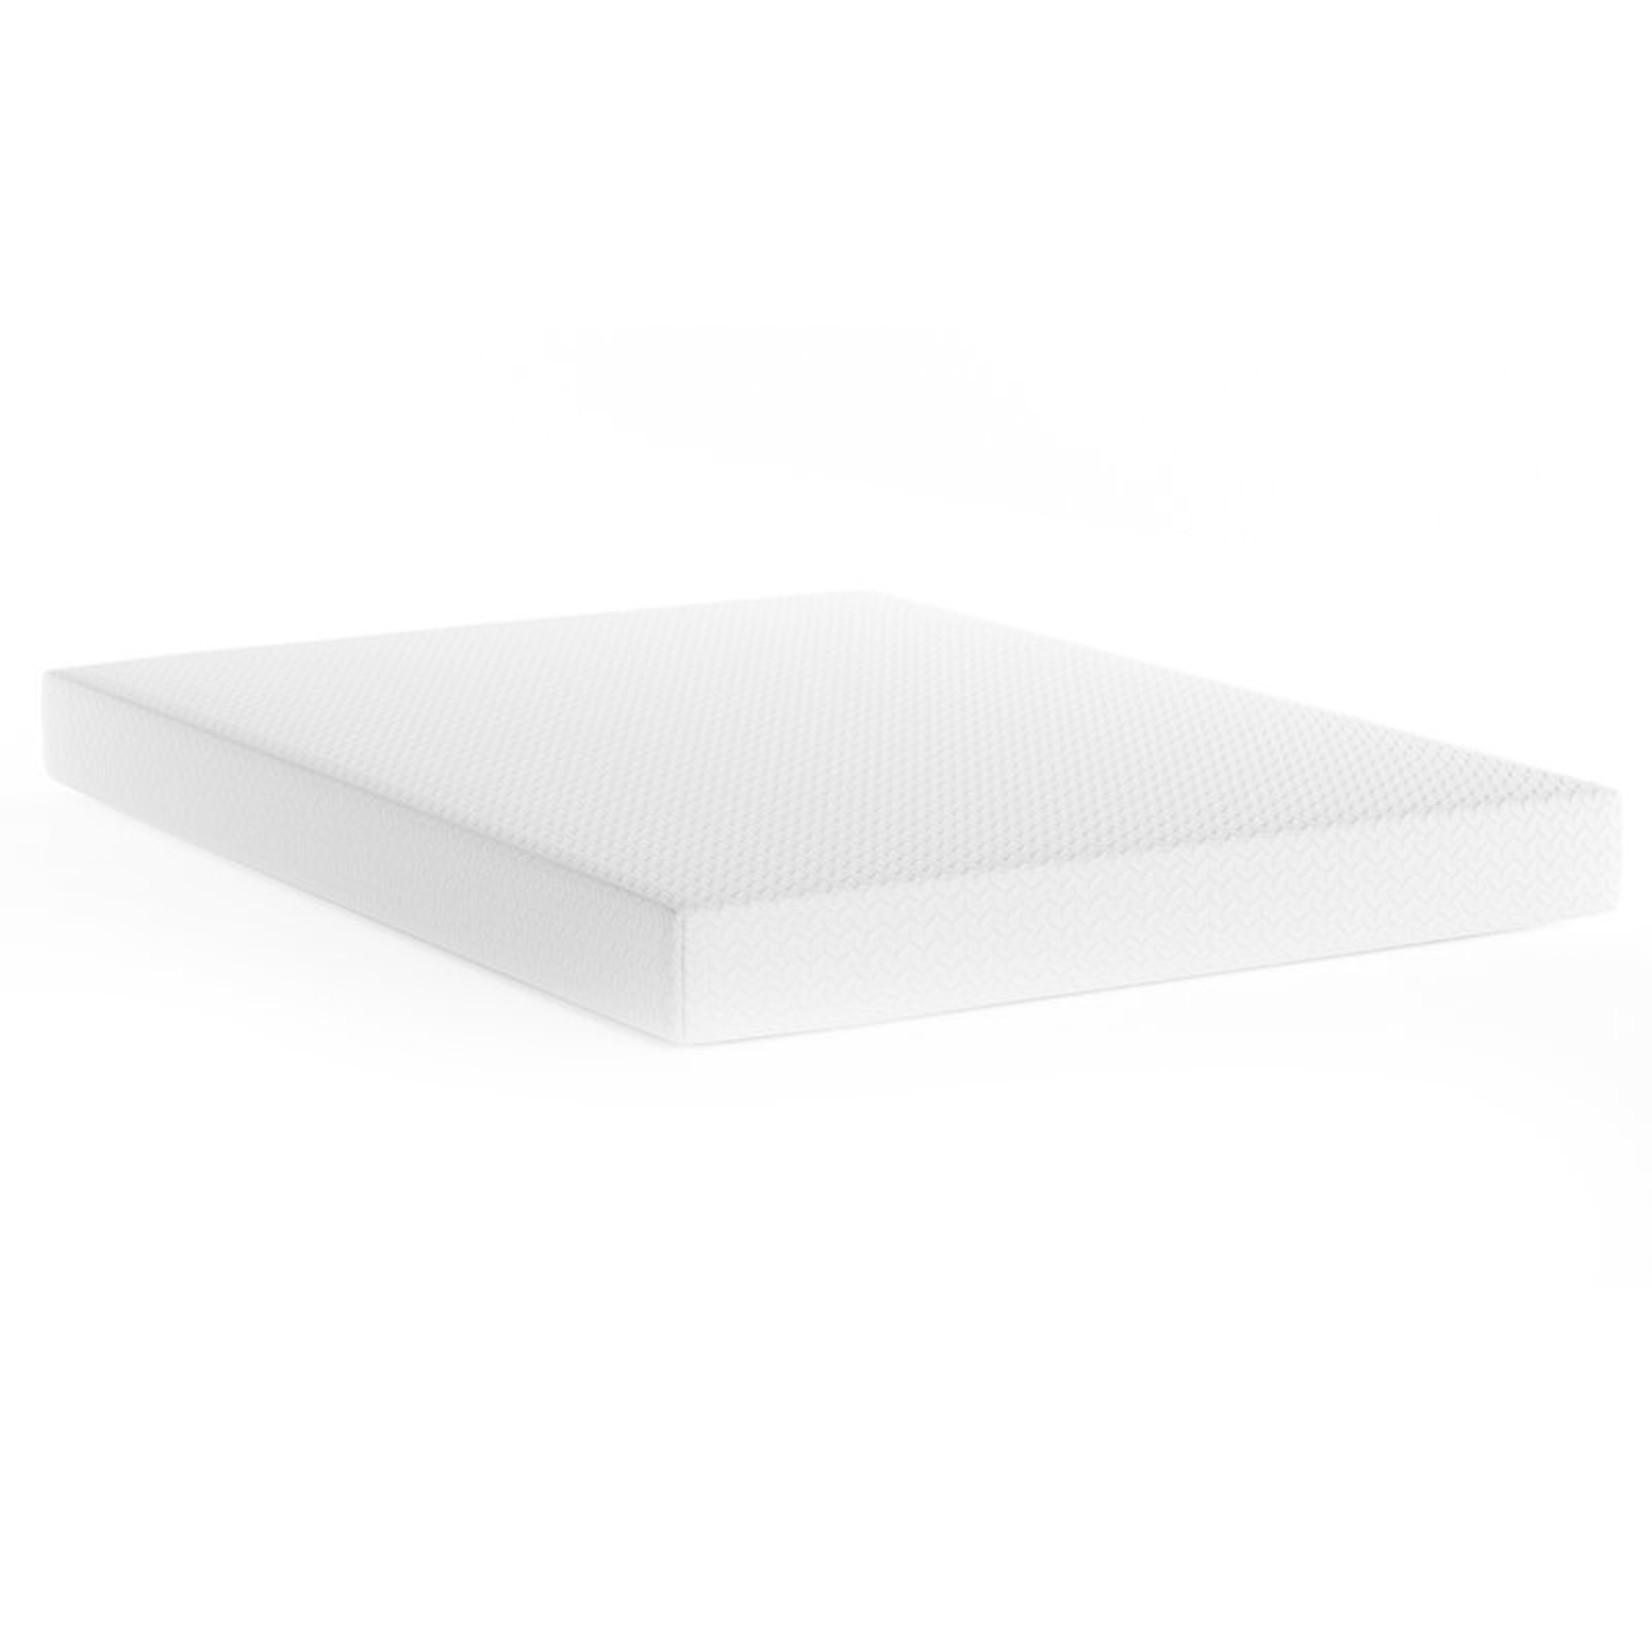 "*King - Medium 8"" Gel Infused Memory Foam Mattress - Final Sale"